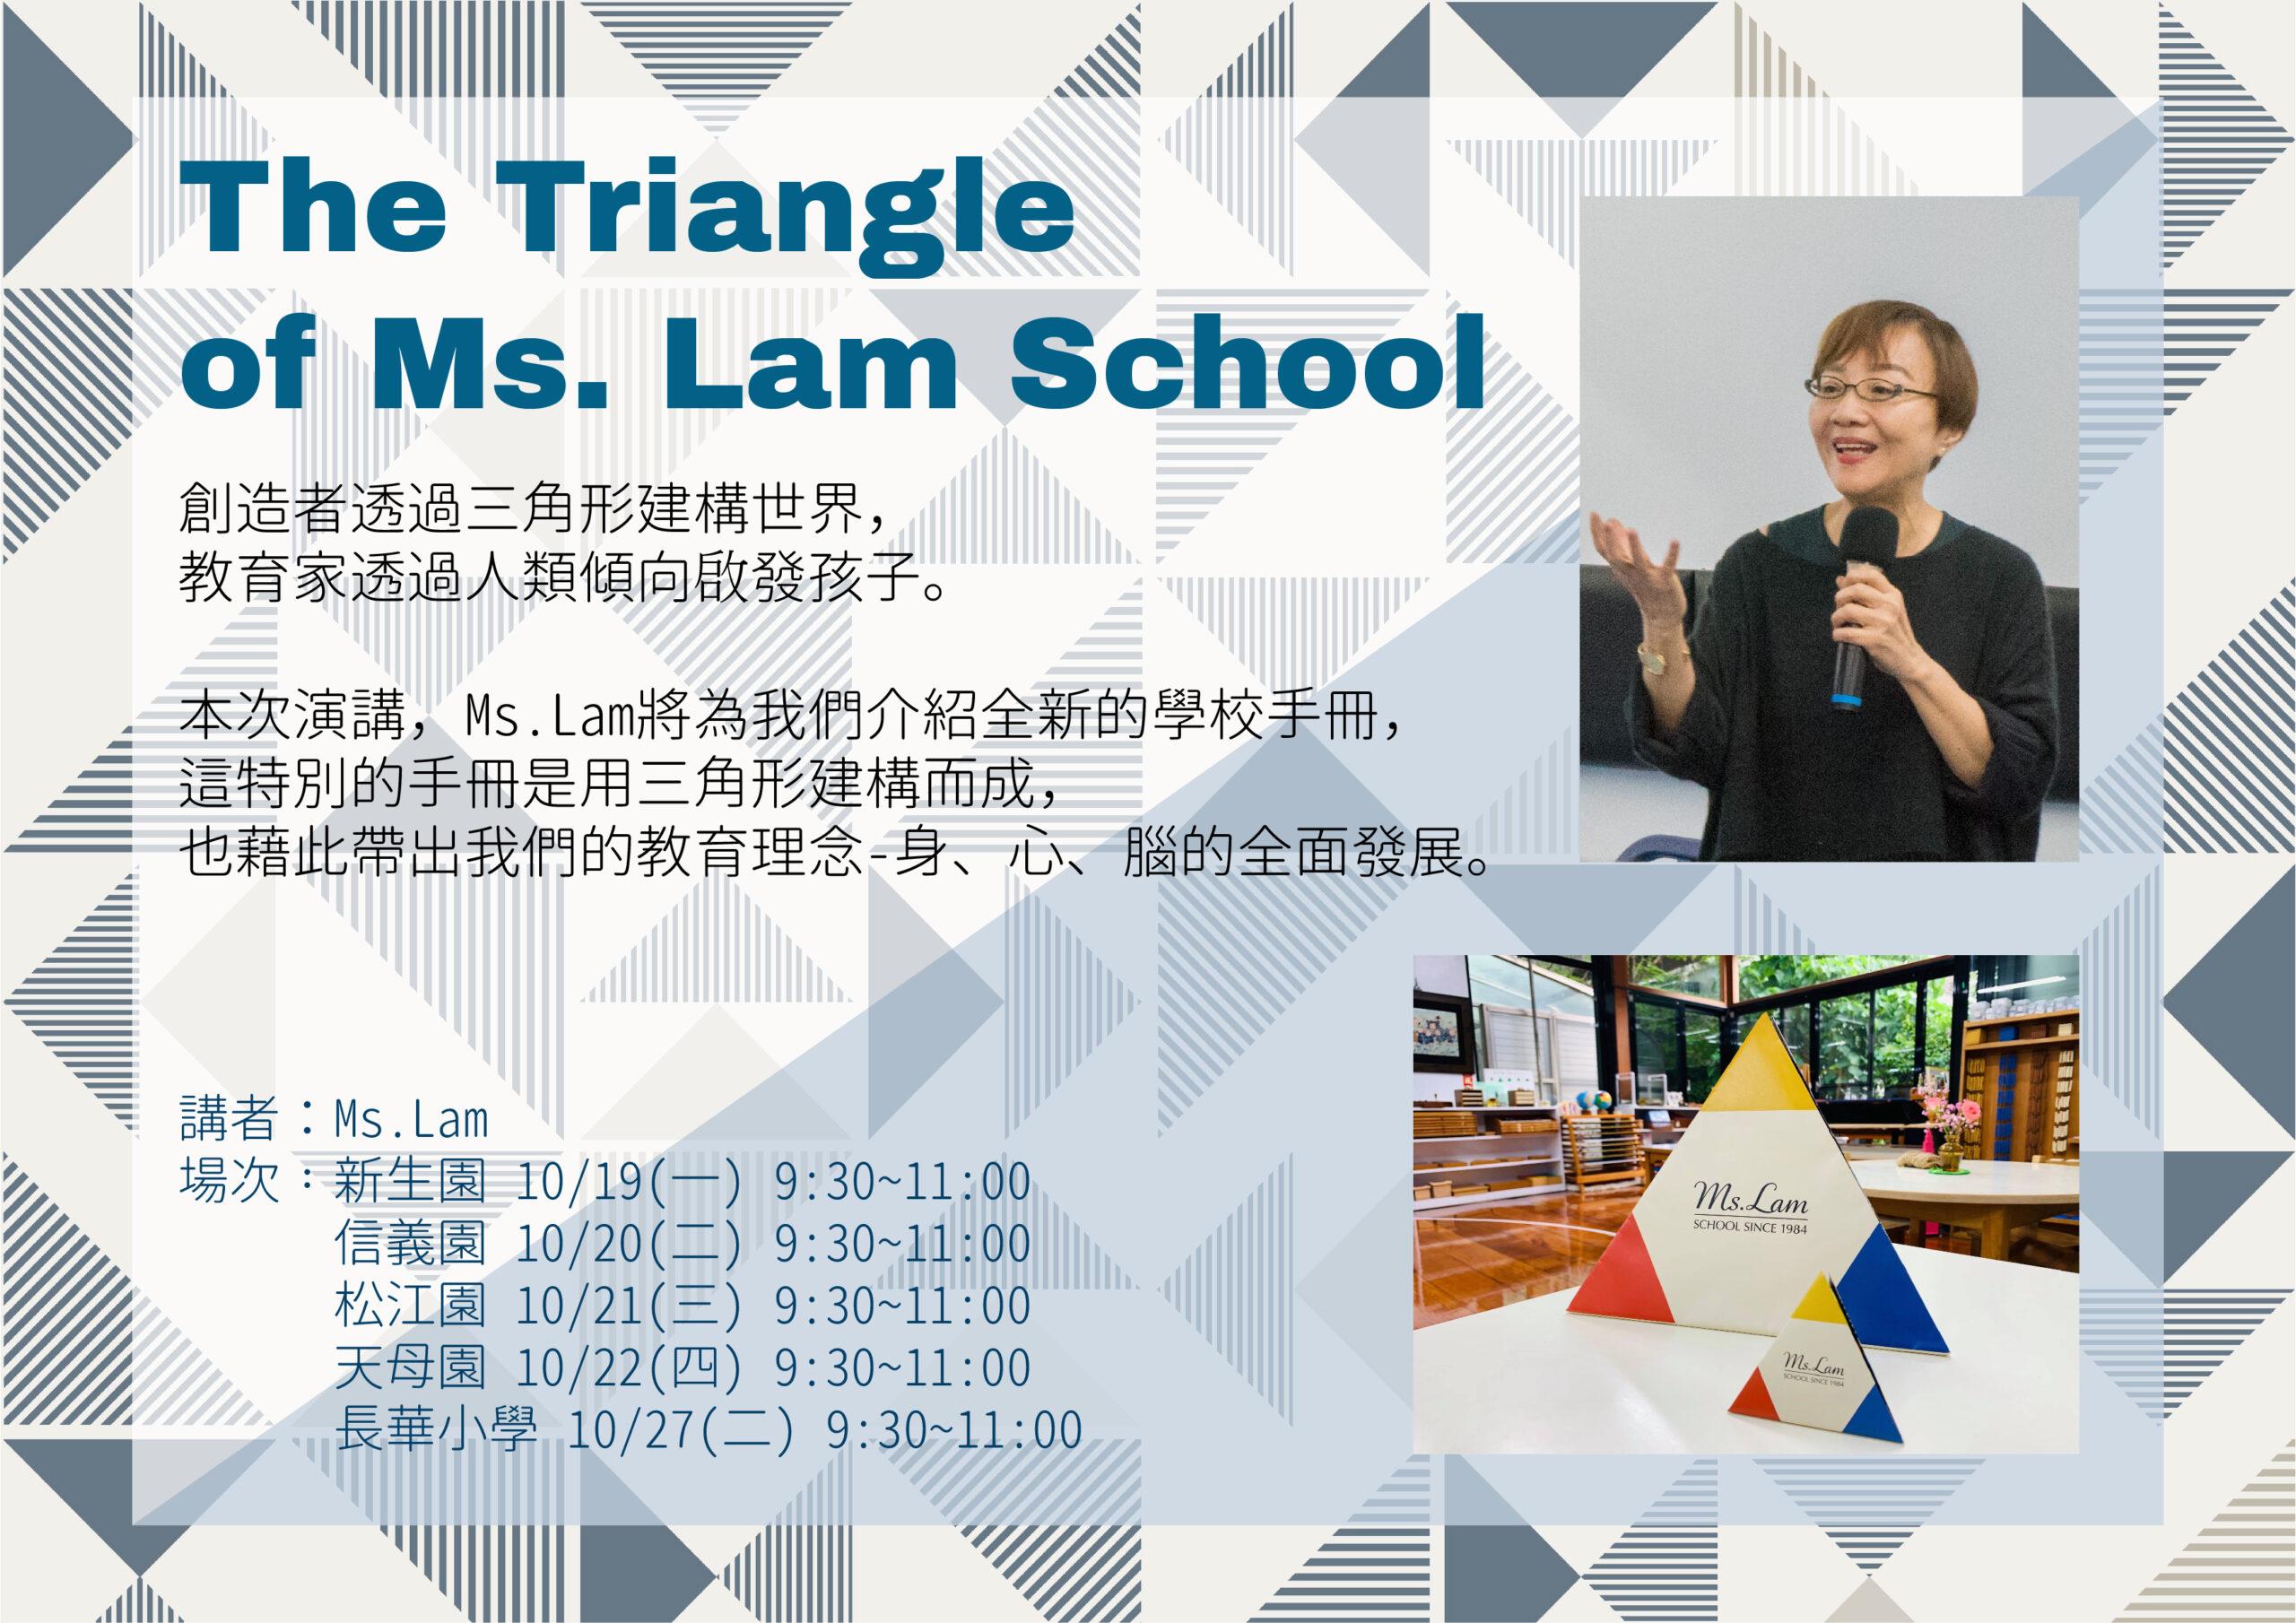 2020.10.27 – 講座資訊 『The Triangle of Ms. Lam School』